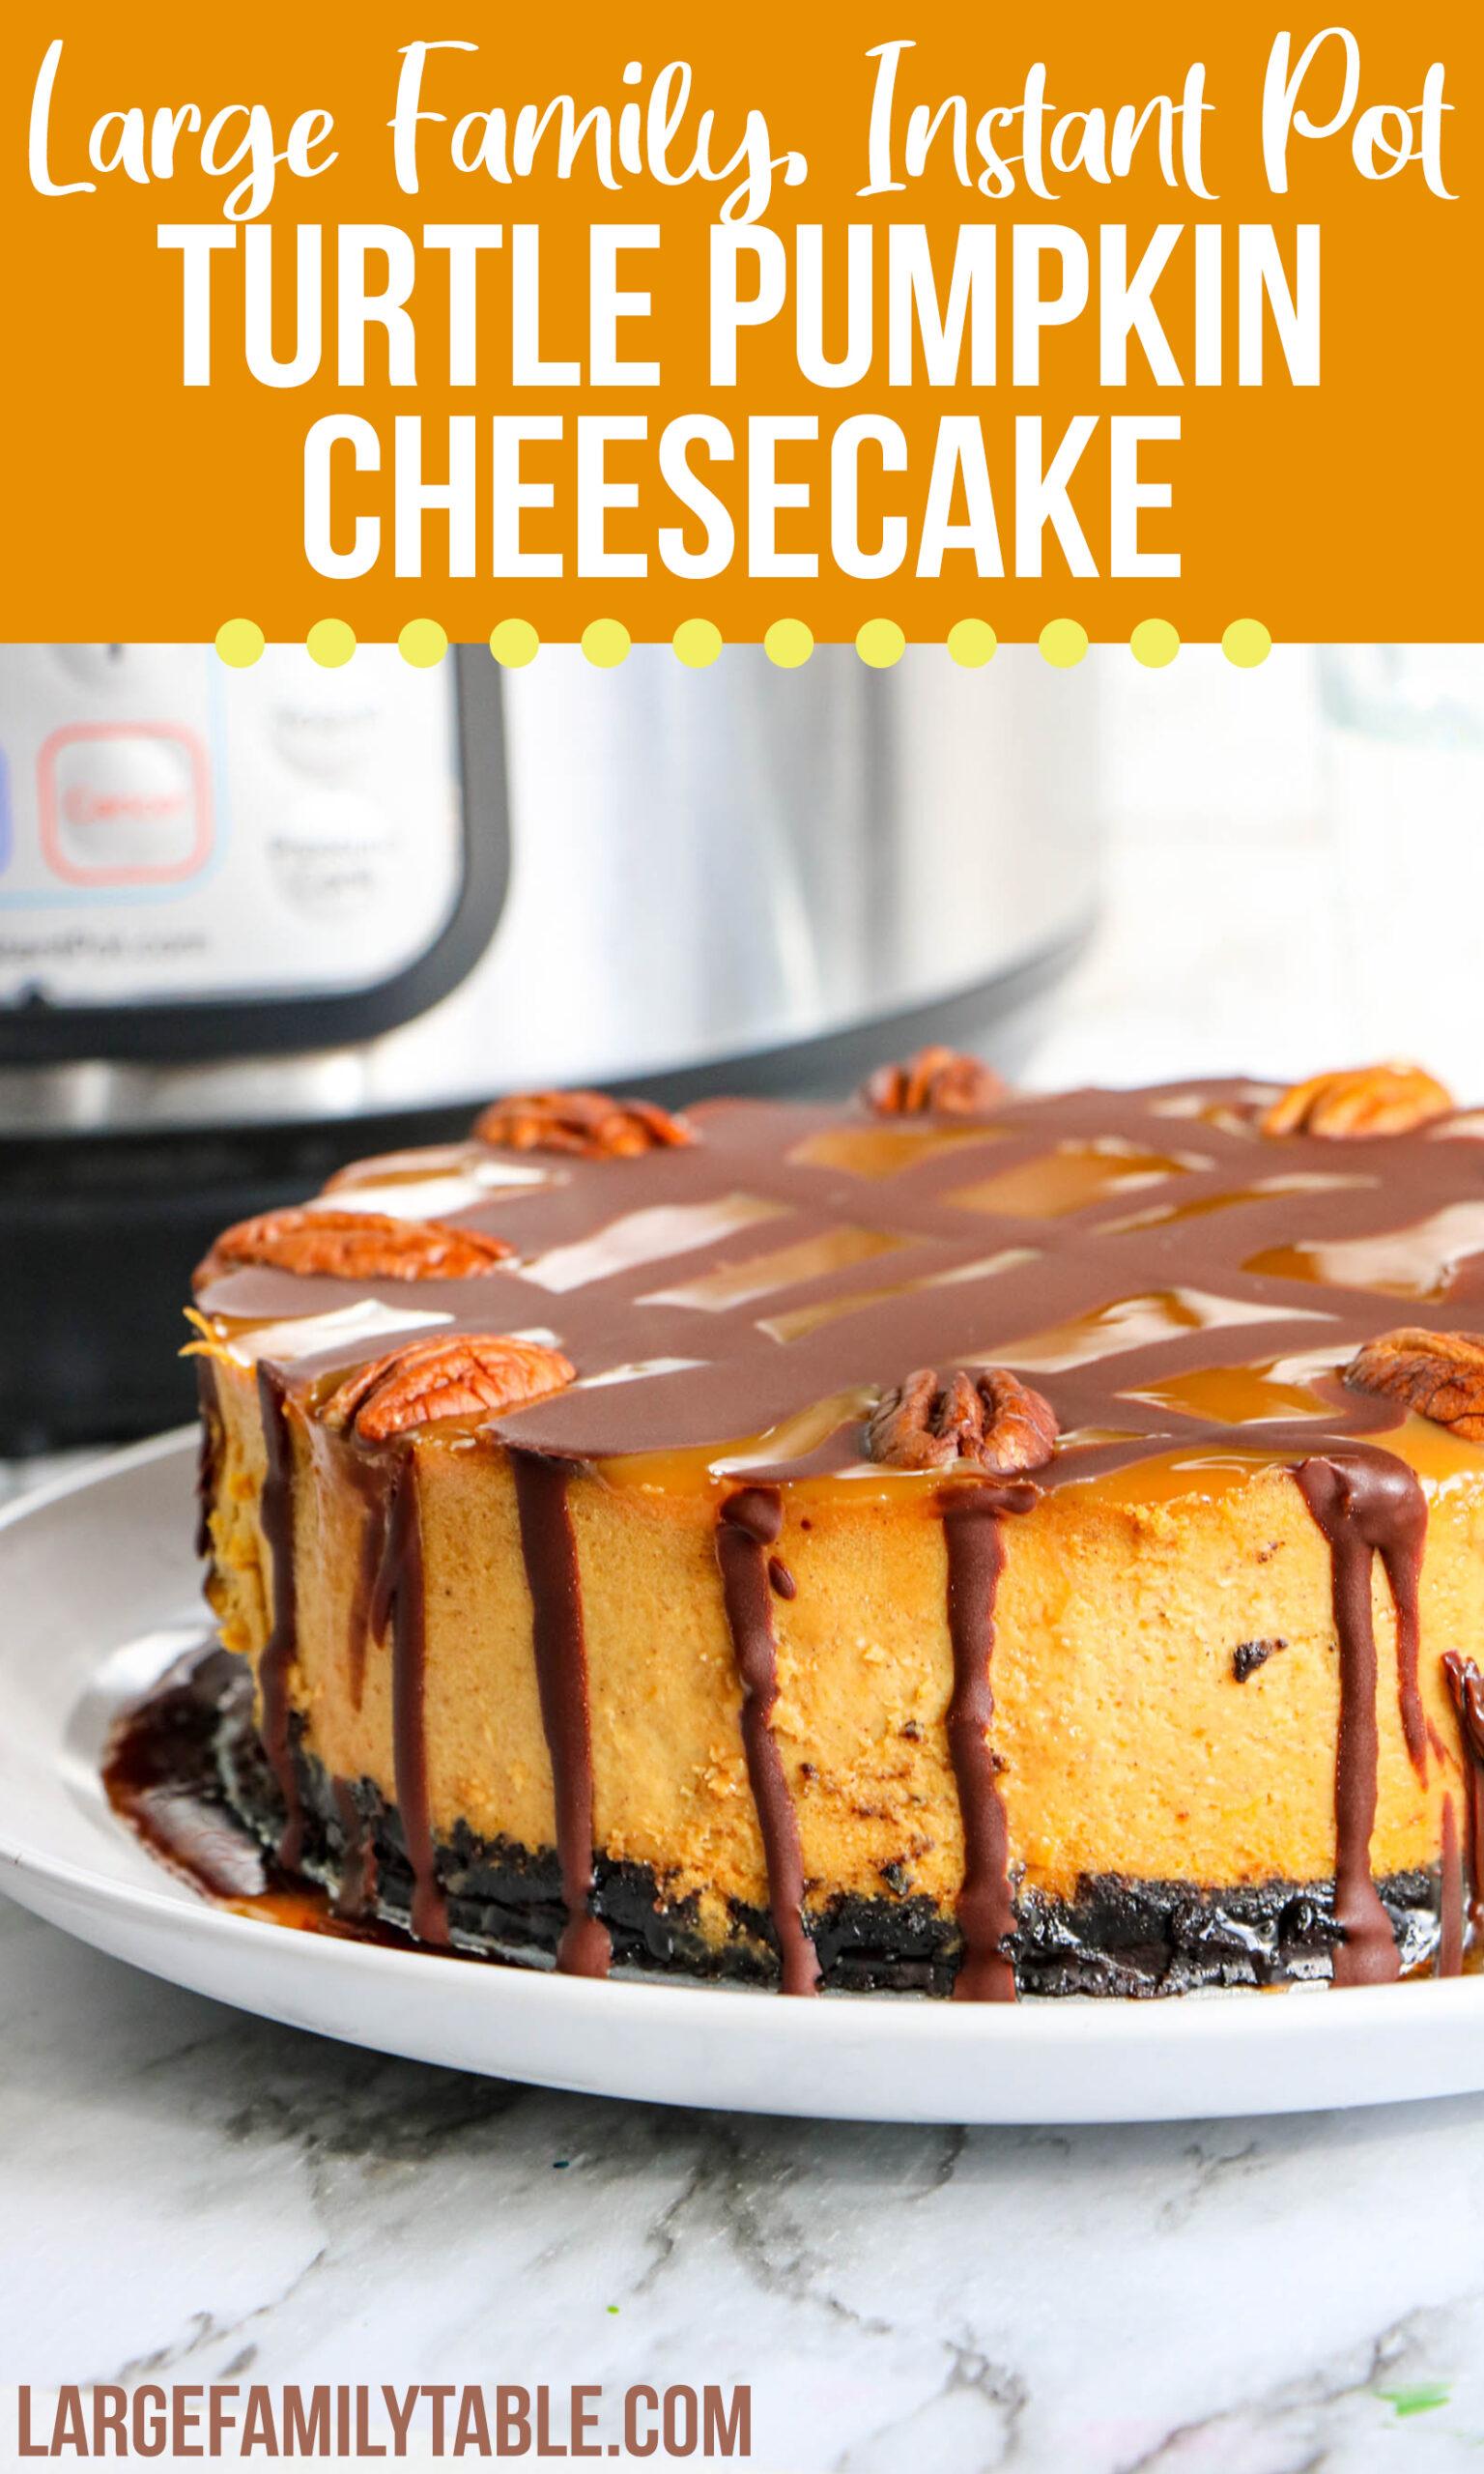 Instant Pot Turtle Pumpkin Cheesecake